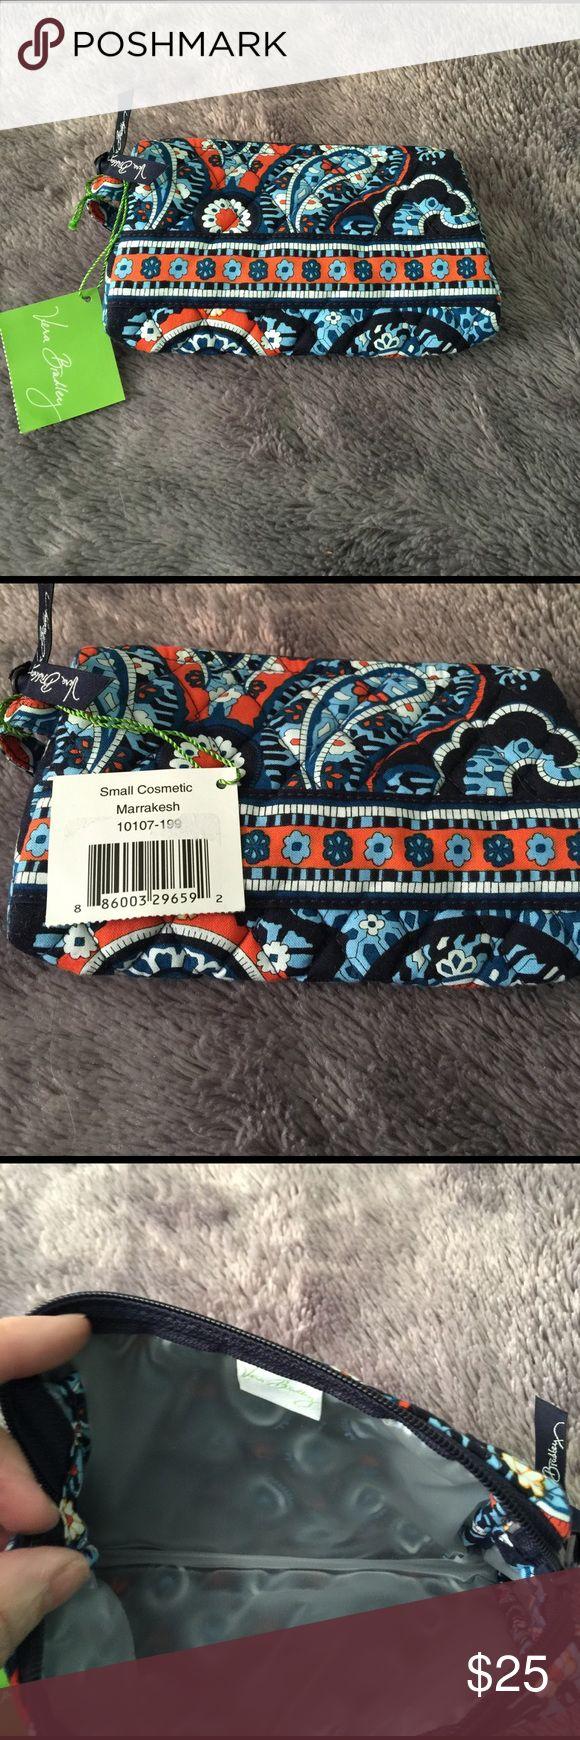 "Vera Bradley Marrakesh small Cosmetic bag Great travel bag for makeup or jewelry 7"" x 5"" Vera Bradley Bags Cosmetic Bags & Cases"